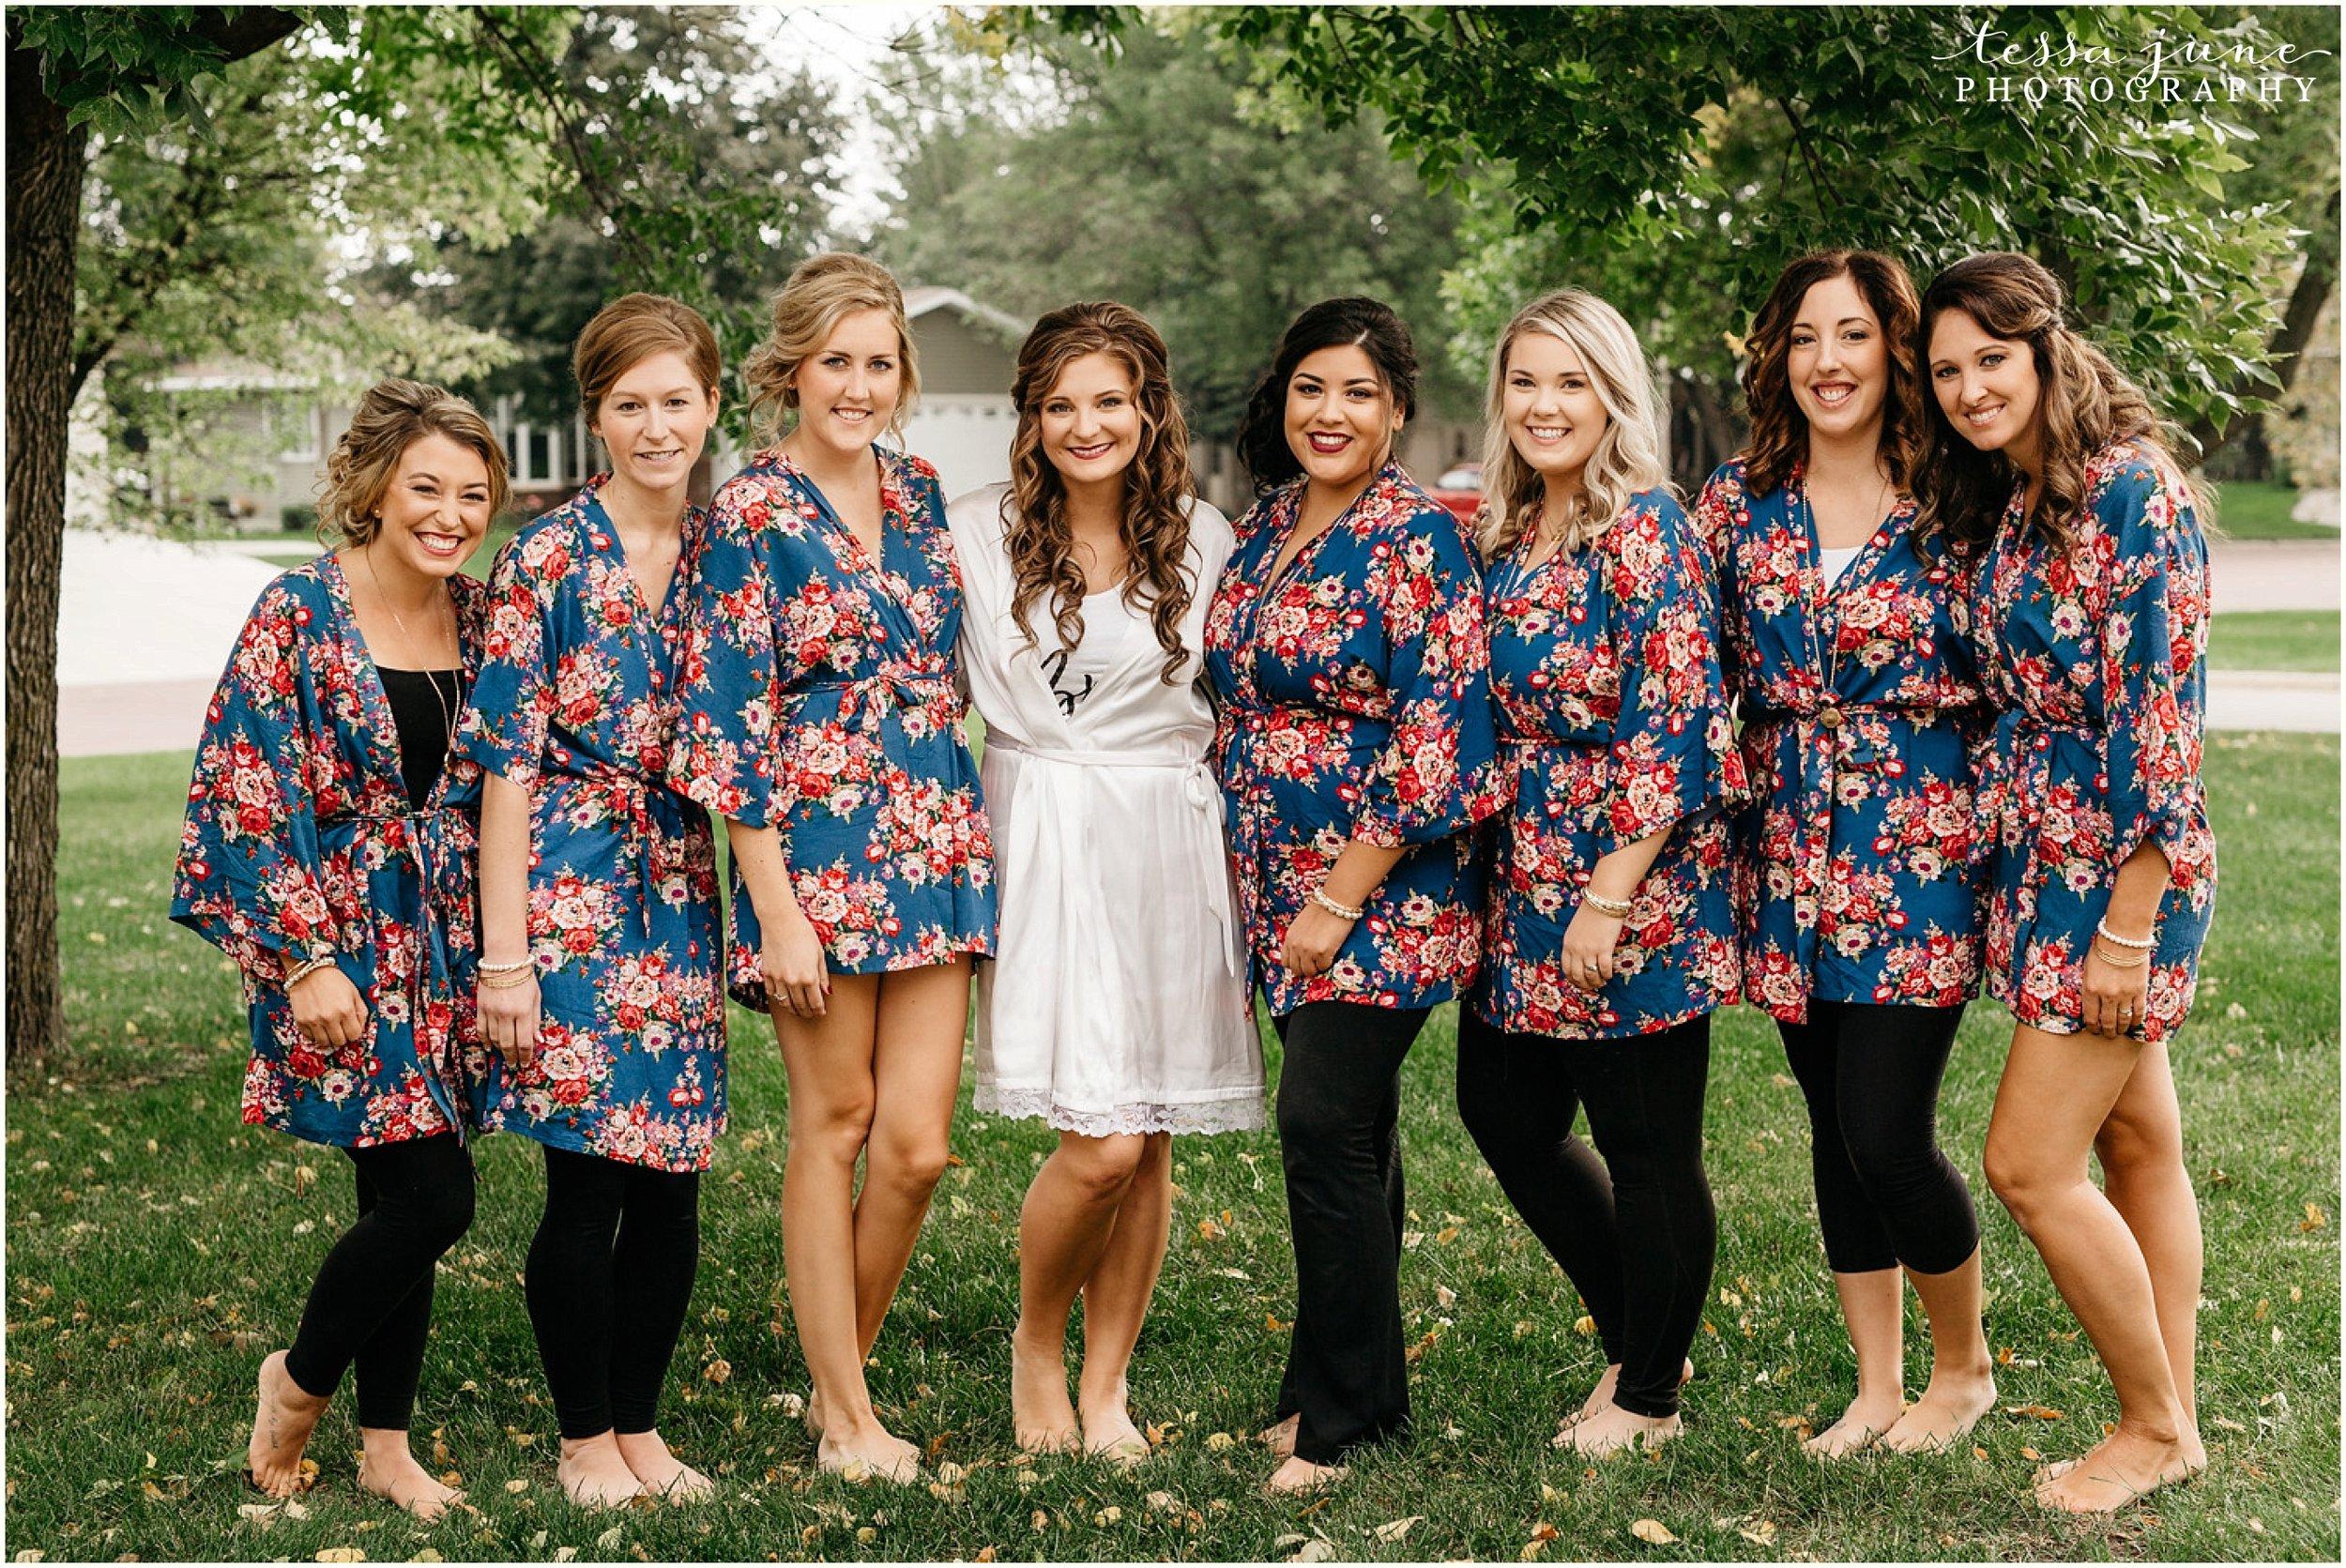 bohemian-minnesota-wedding-mismatched-bridesmaid-dresses-waterfall-st-cloud-tessa-june-photography-19.jpg